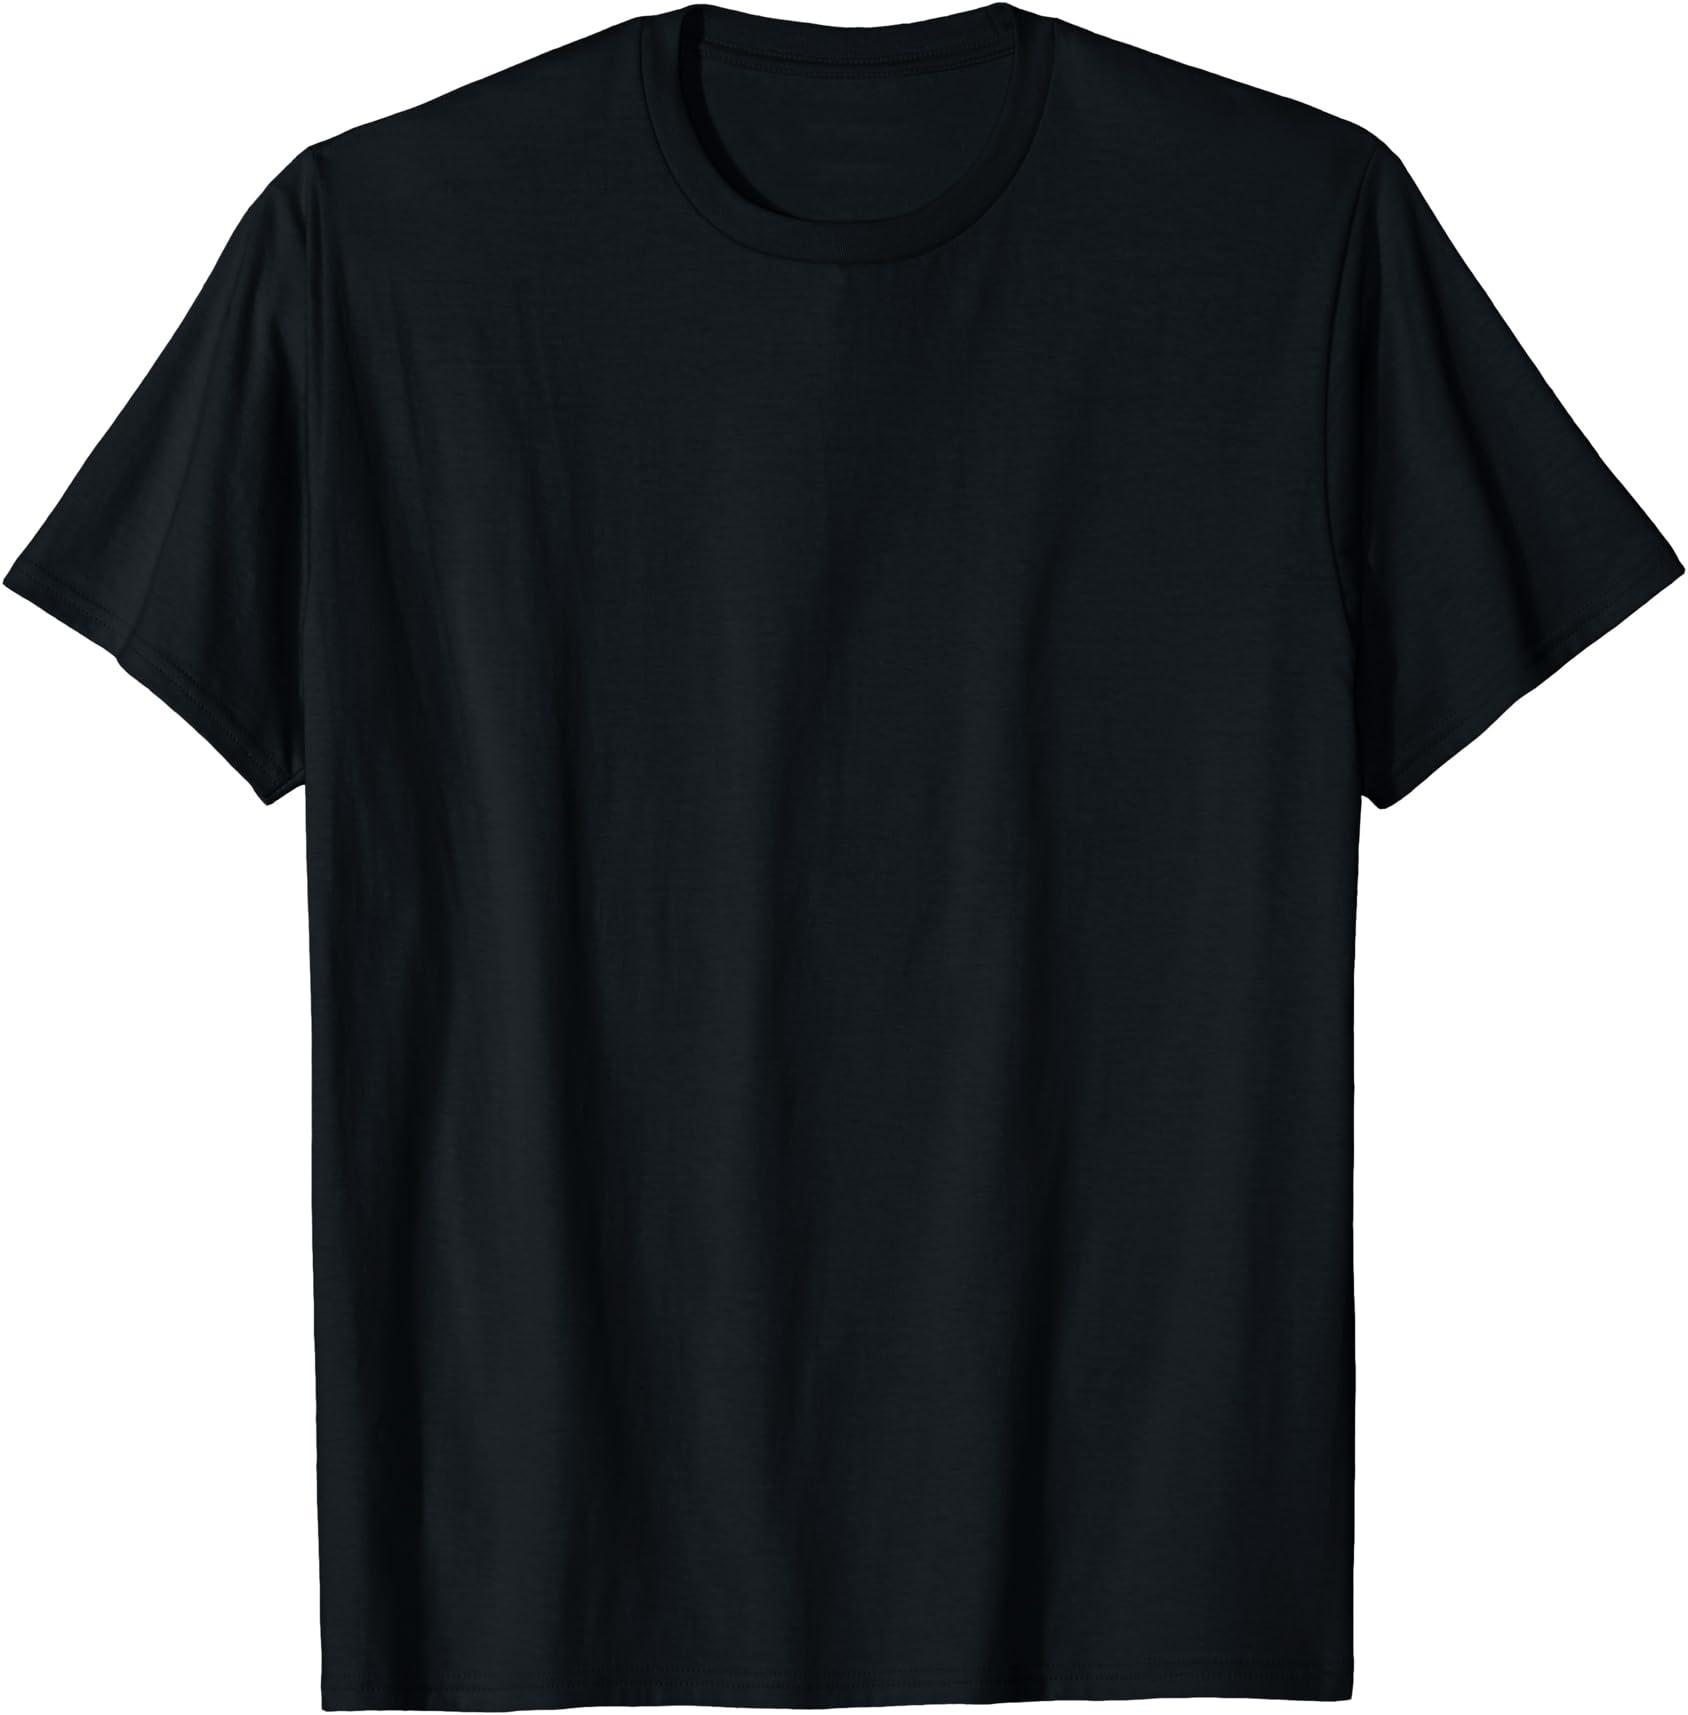 Funny mens t shirt friend zone 96 69 varcity